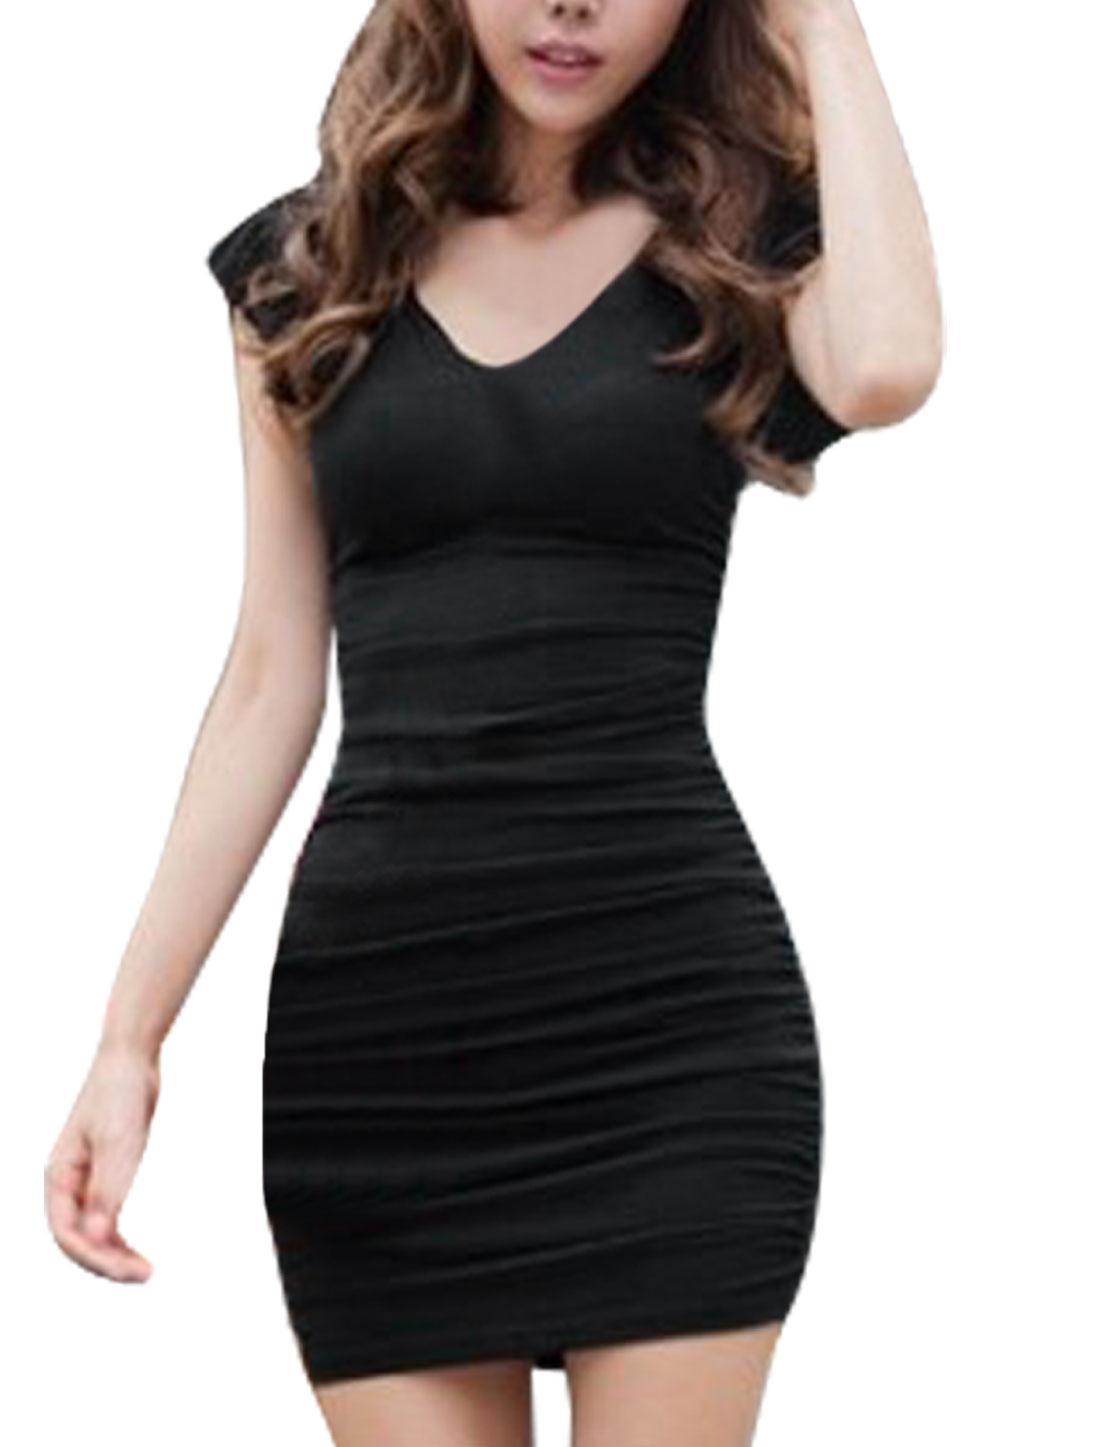 Women Ruffled Sleeves Double Deep V Neck Bandage Side Elastic Shirr Black Dress XS